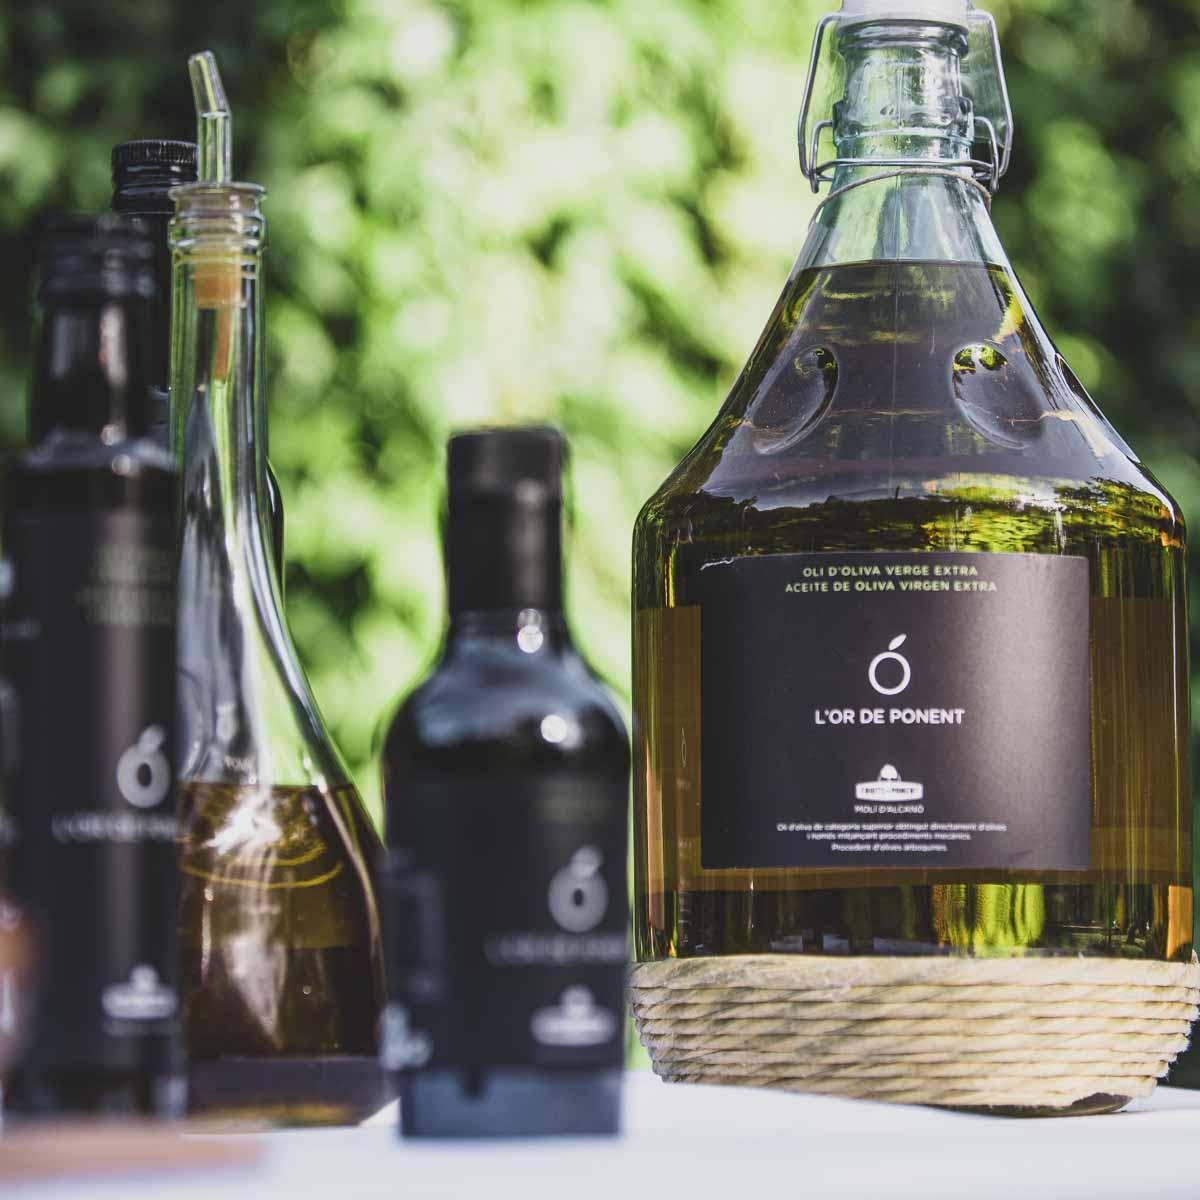 5 L- vidrio -Or-de-Ponent-aove-aceite-oliva-virgen-extra-garrigues-denominacion-origen-02-2